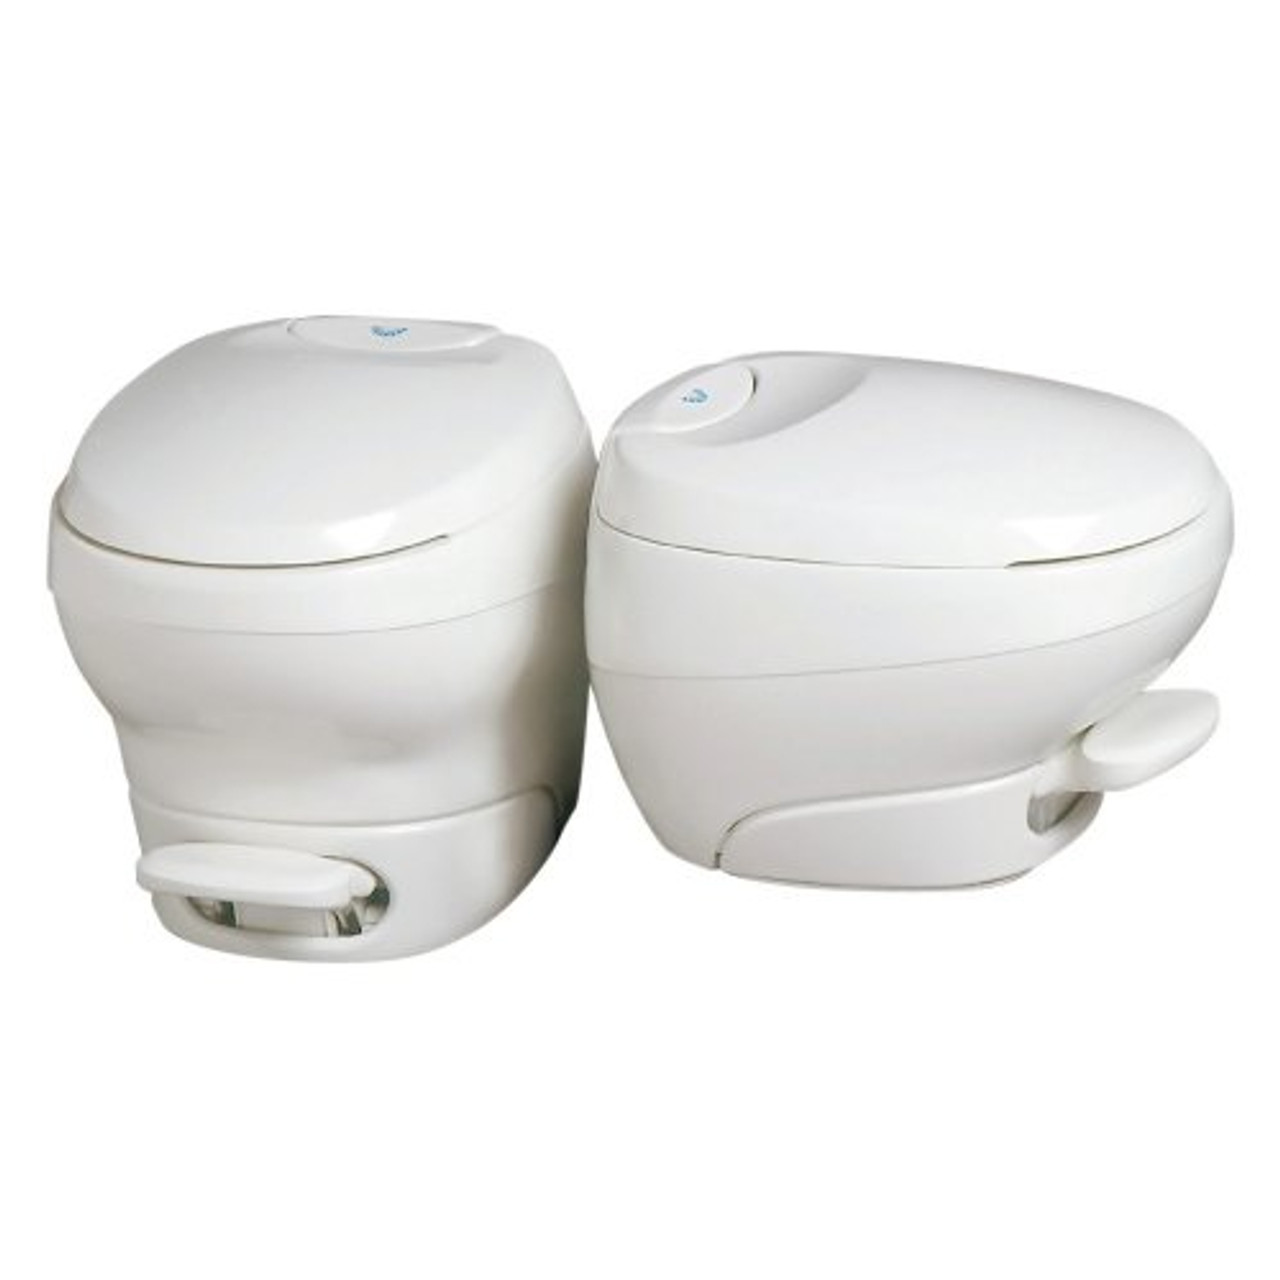 Thetford Aqua Magic Bravura Permanent Toilet High & Low